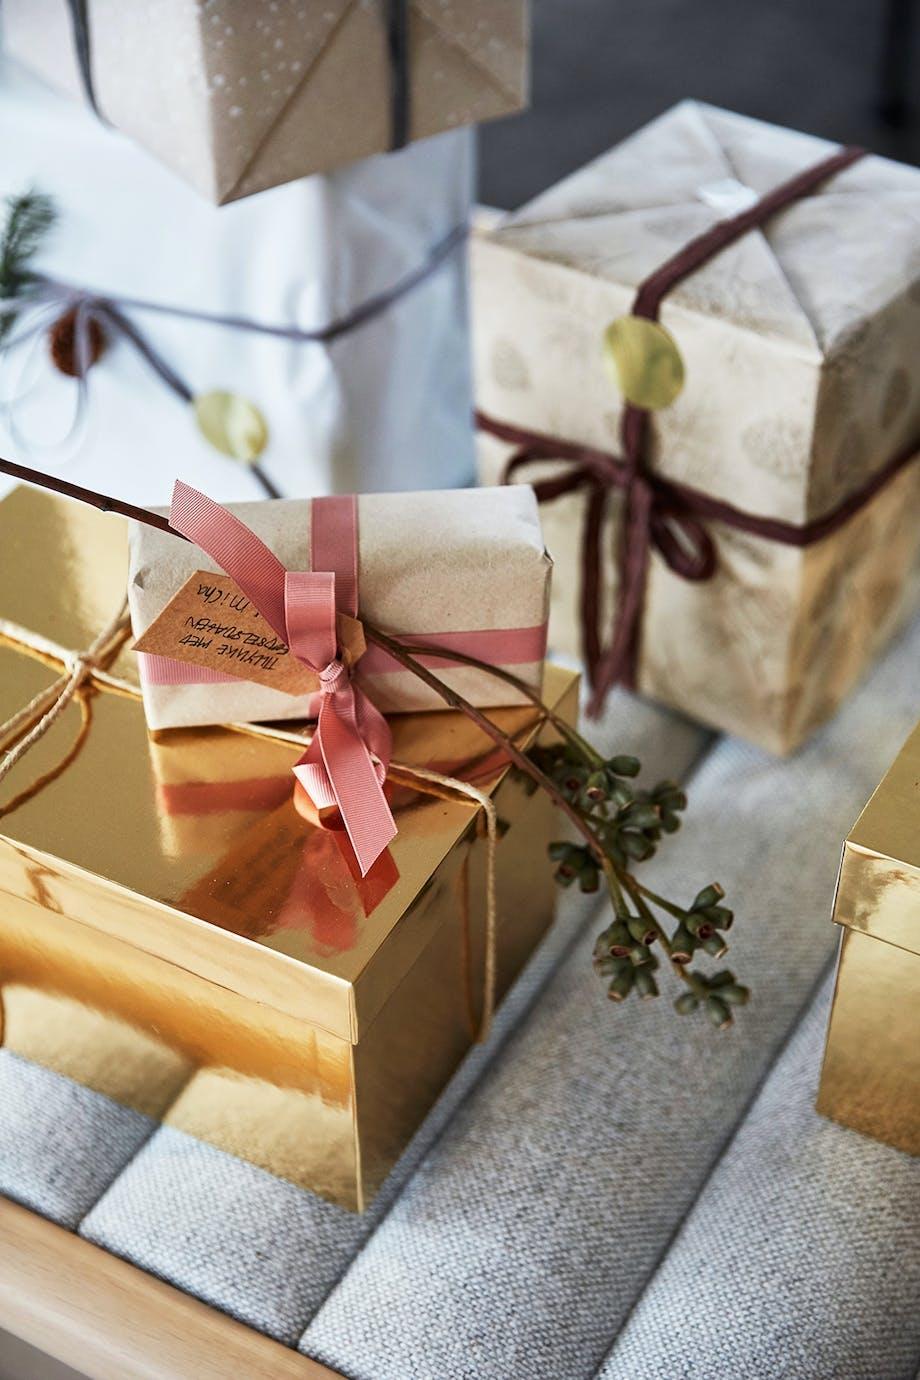 gaver julegaver pakker indpakning